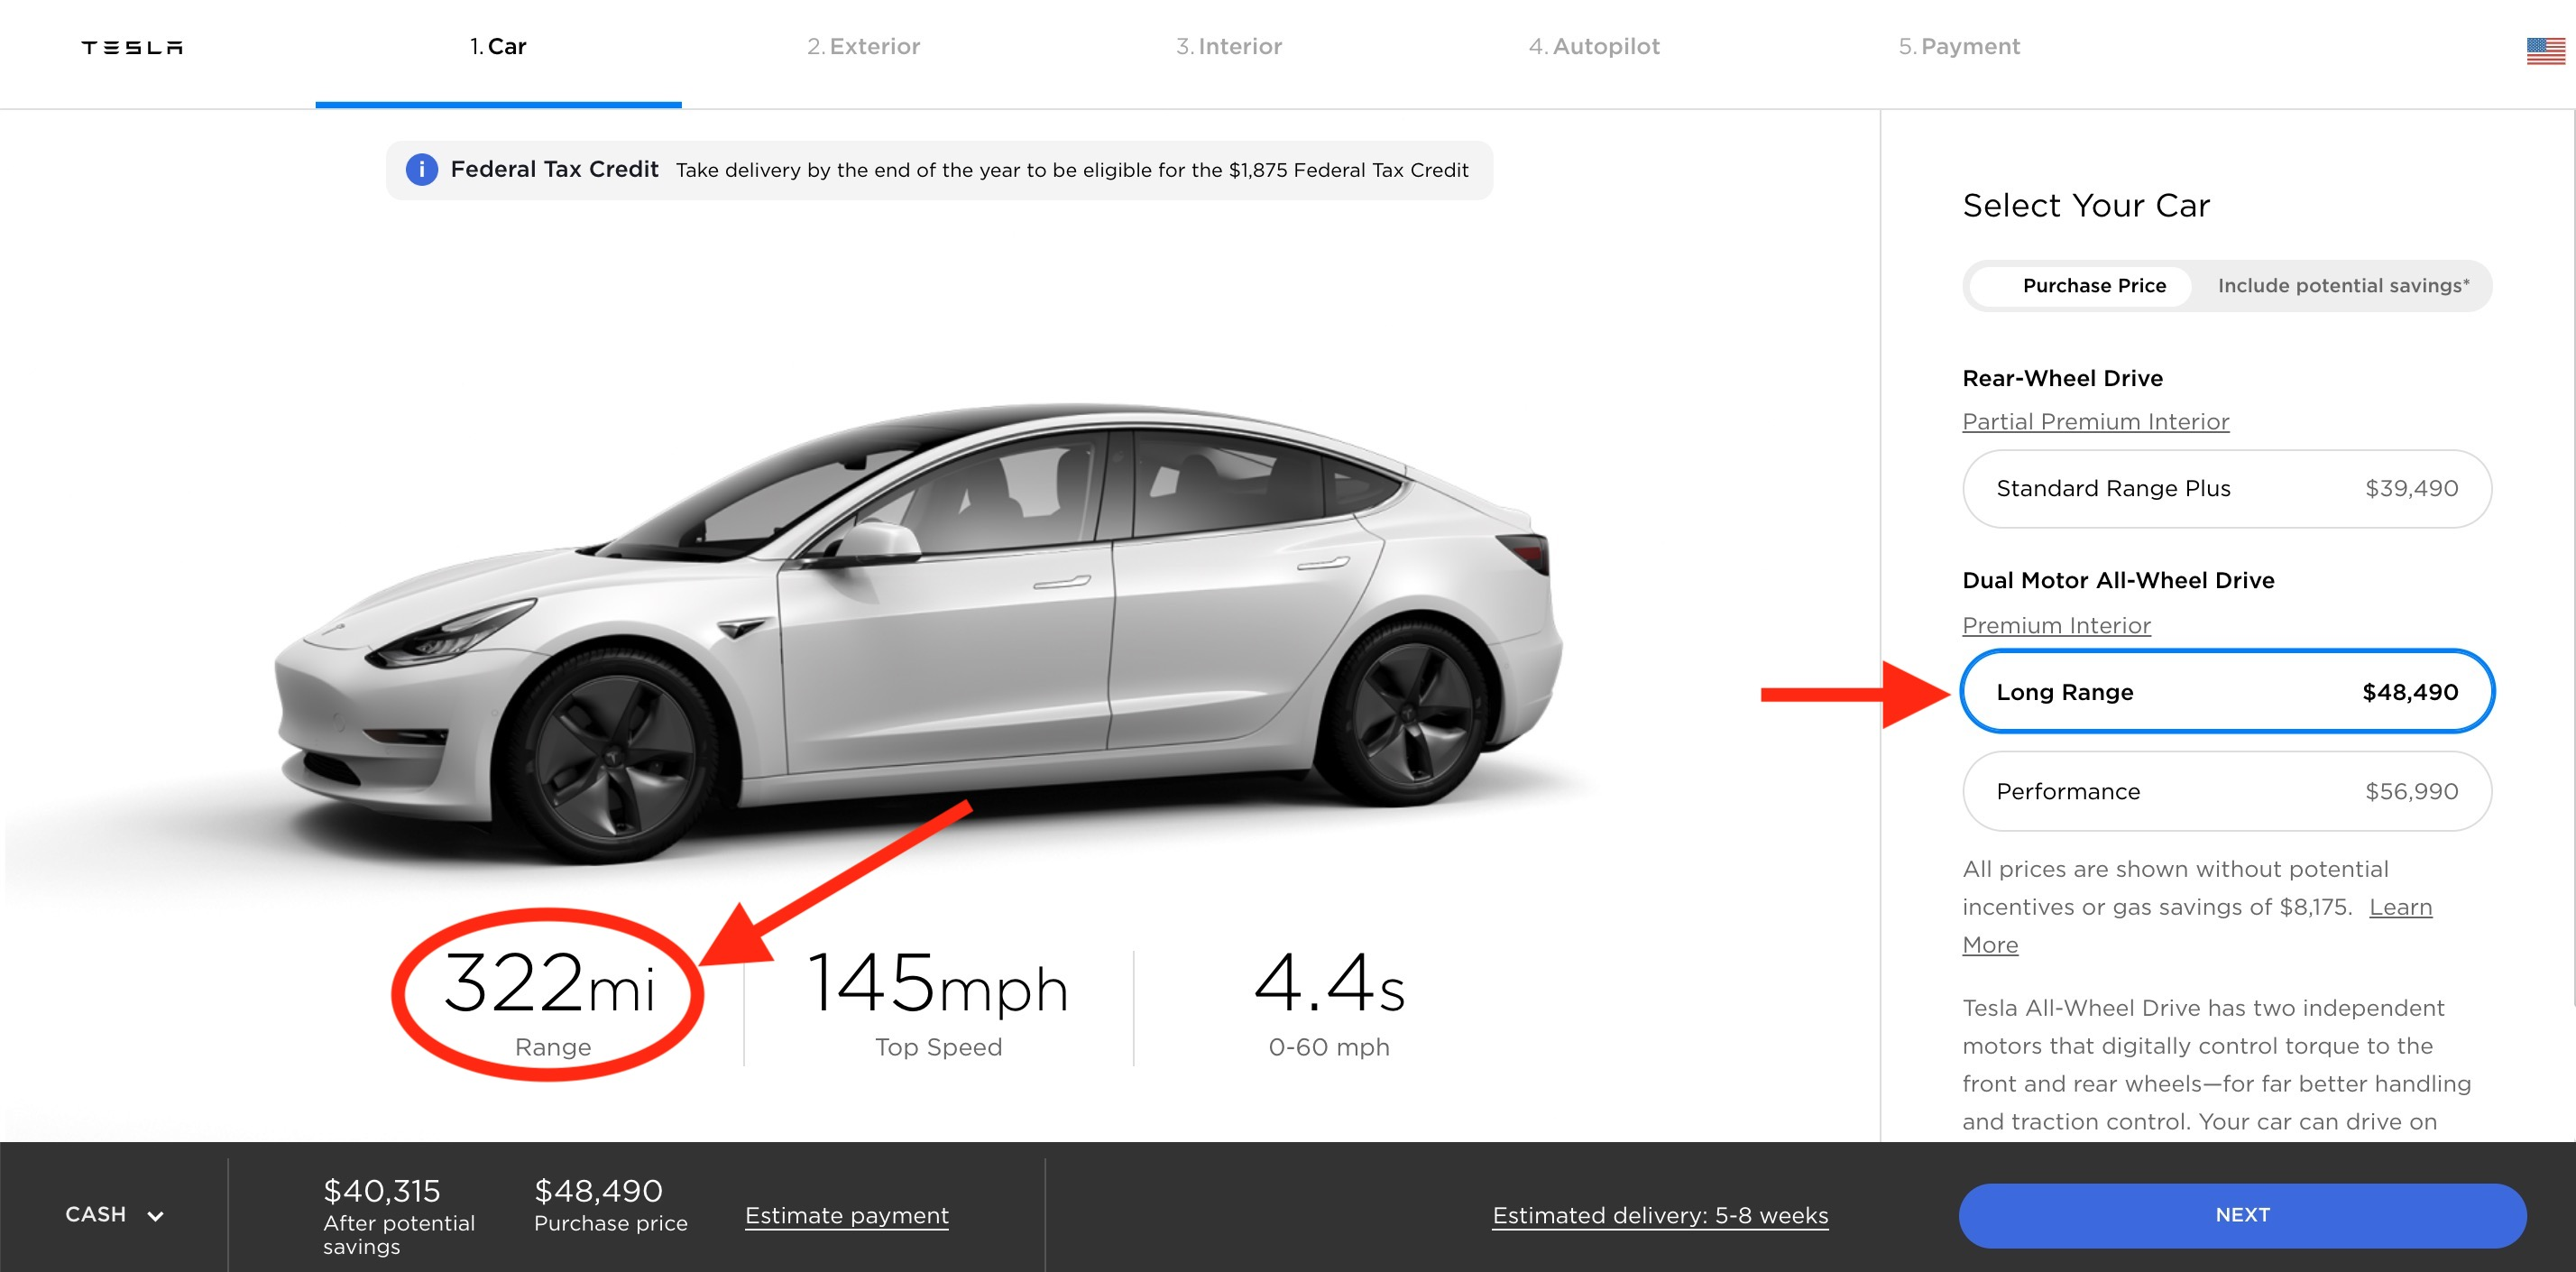 Tesla Increases Range And Price Of The Model 3 Long Range Electrek